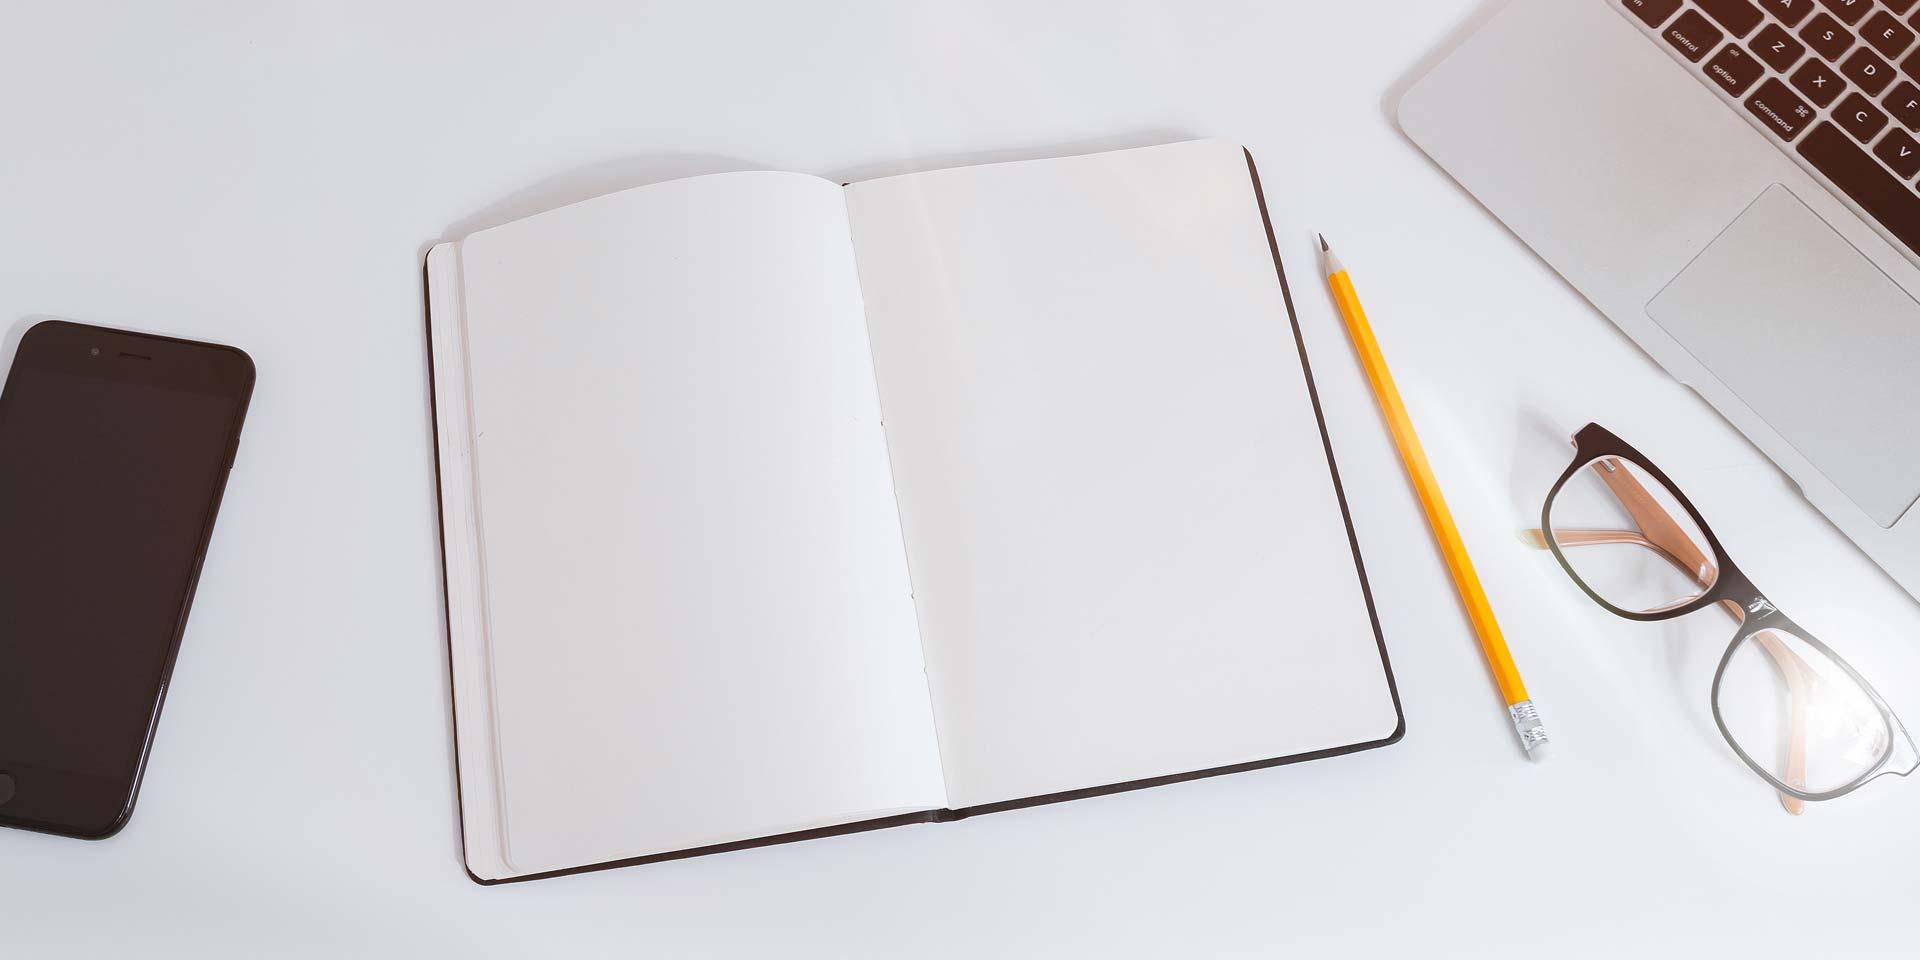 Starting_a_career_in_digital_marketing